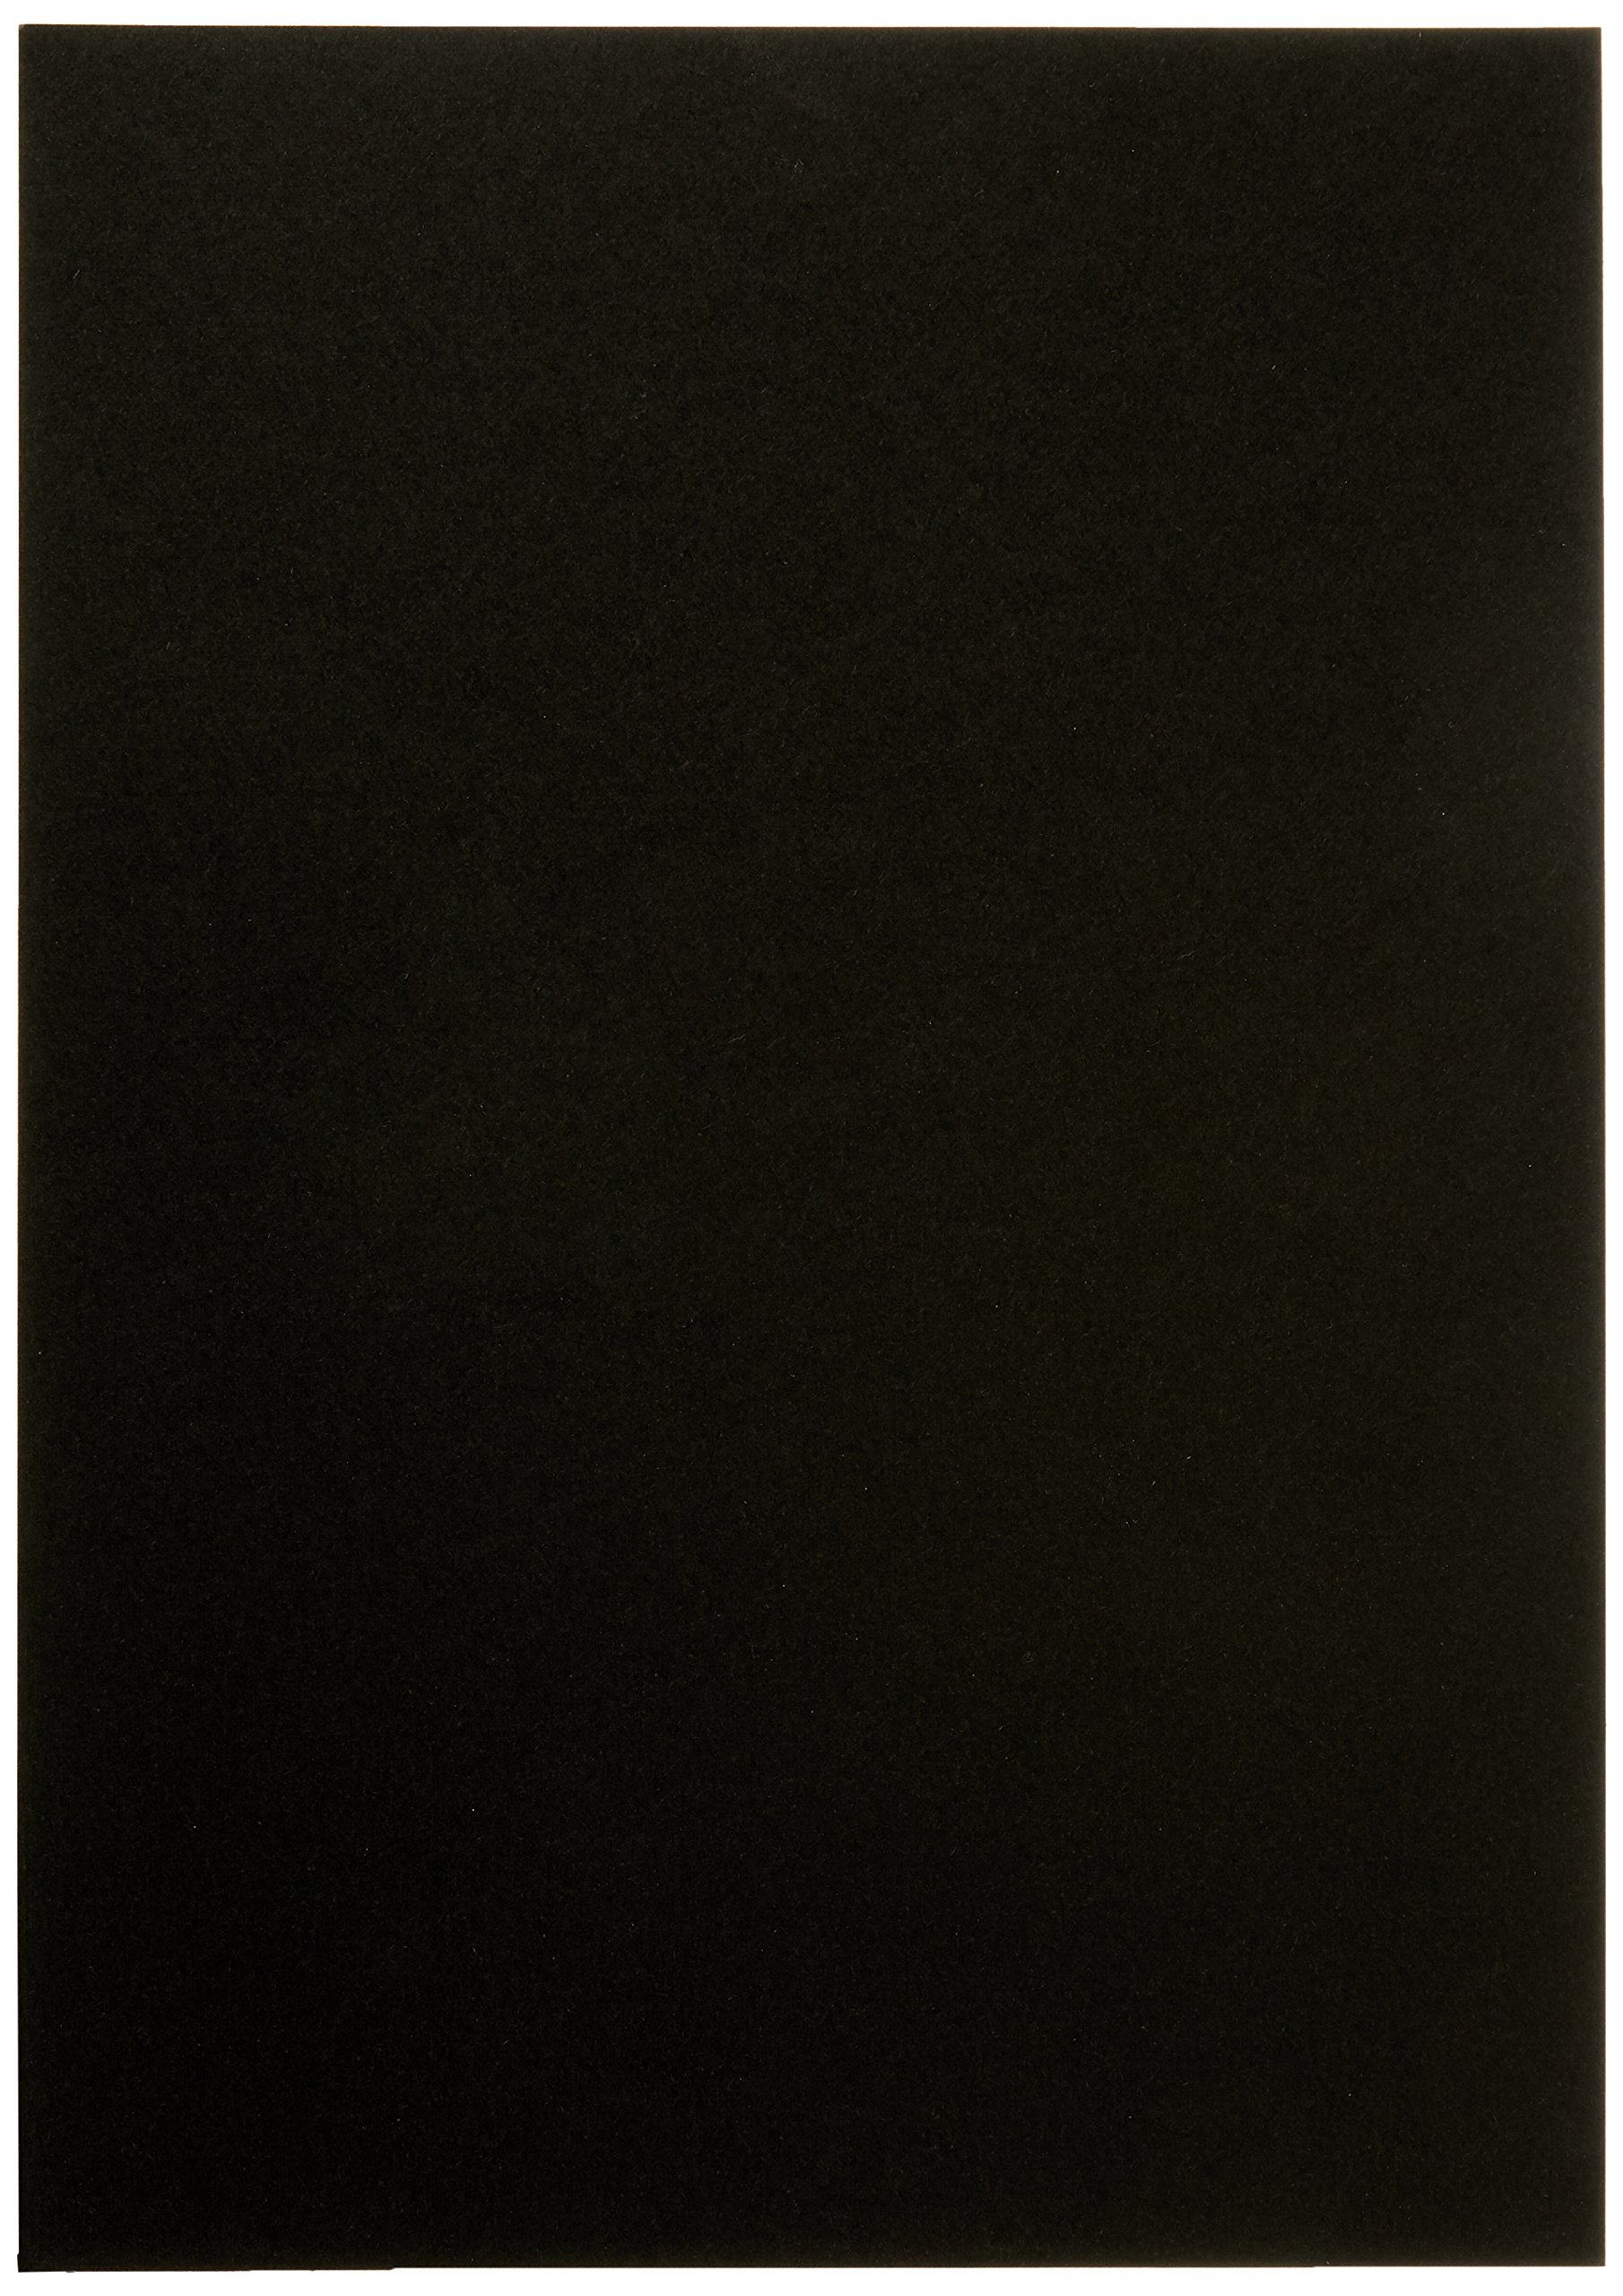 GOP 7640172351581Flap Linen Texture A4Pack of 100Black